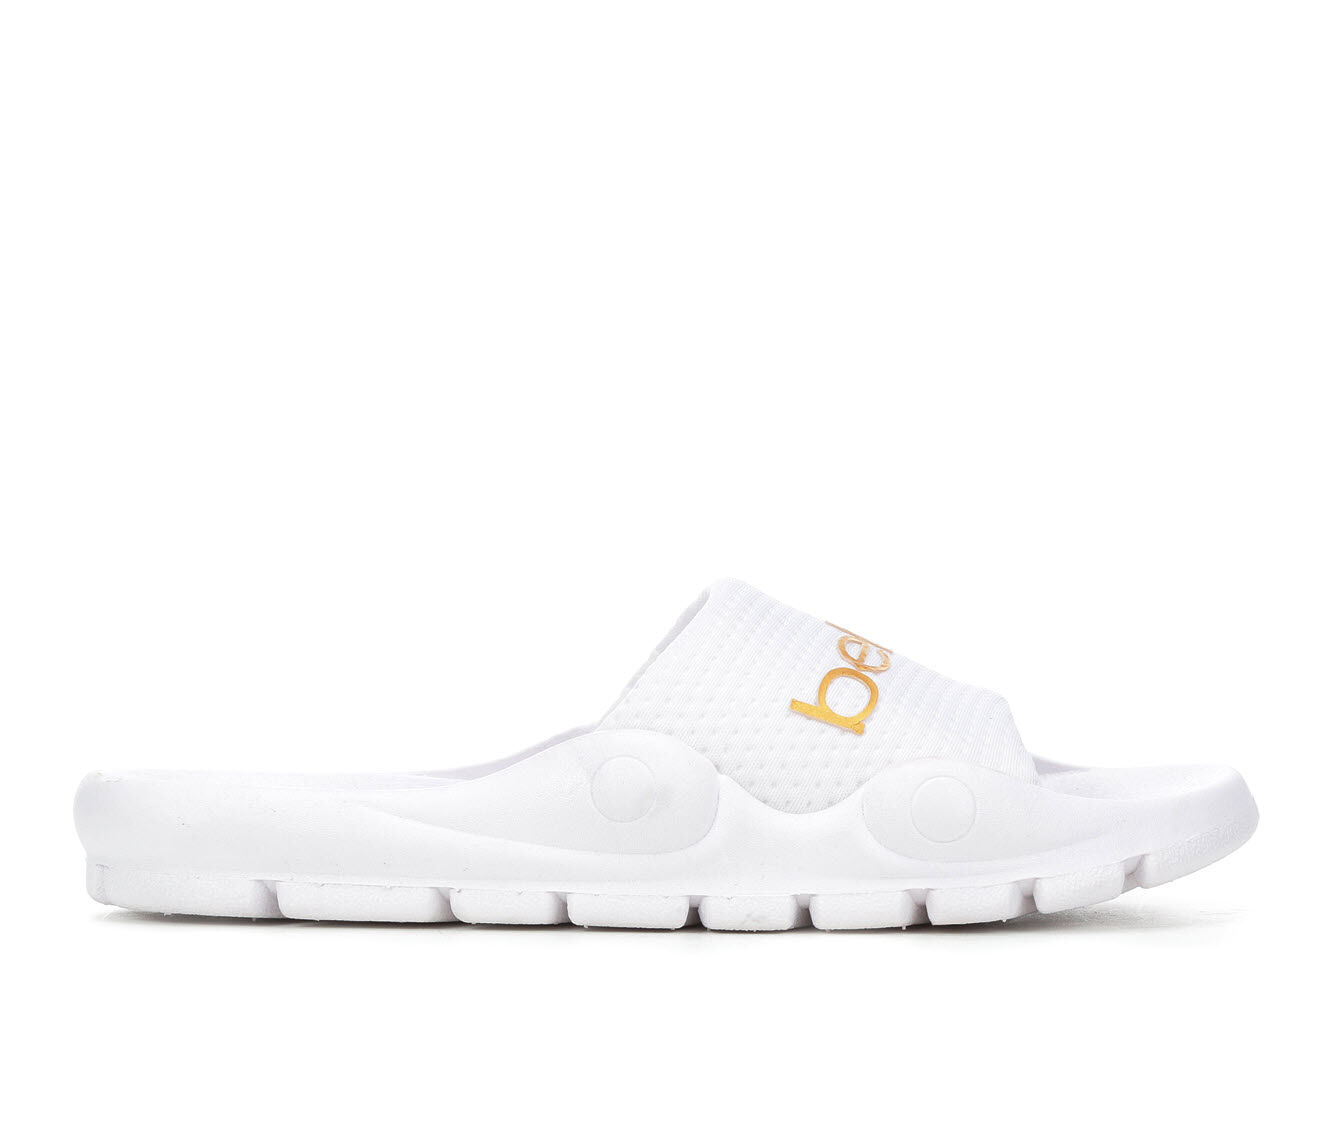 Women's Bebe Sport Nayomie Sandals White